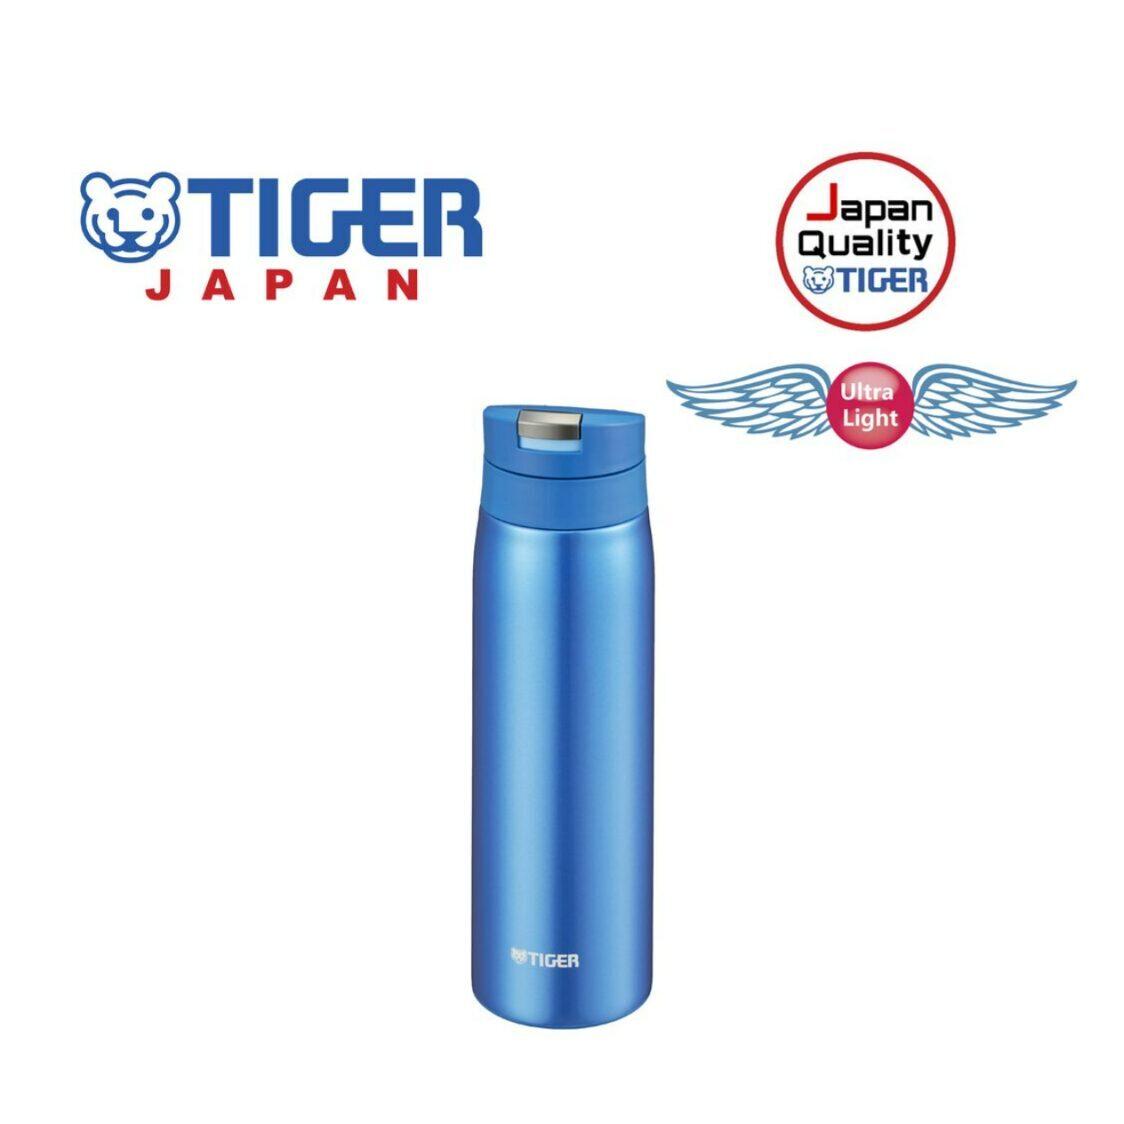 Tiger 500ml Double Stainless Steel Mug MCX-A501AK - Sky Blue